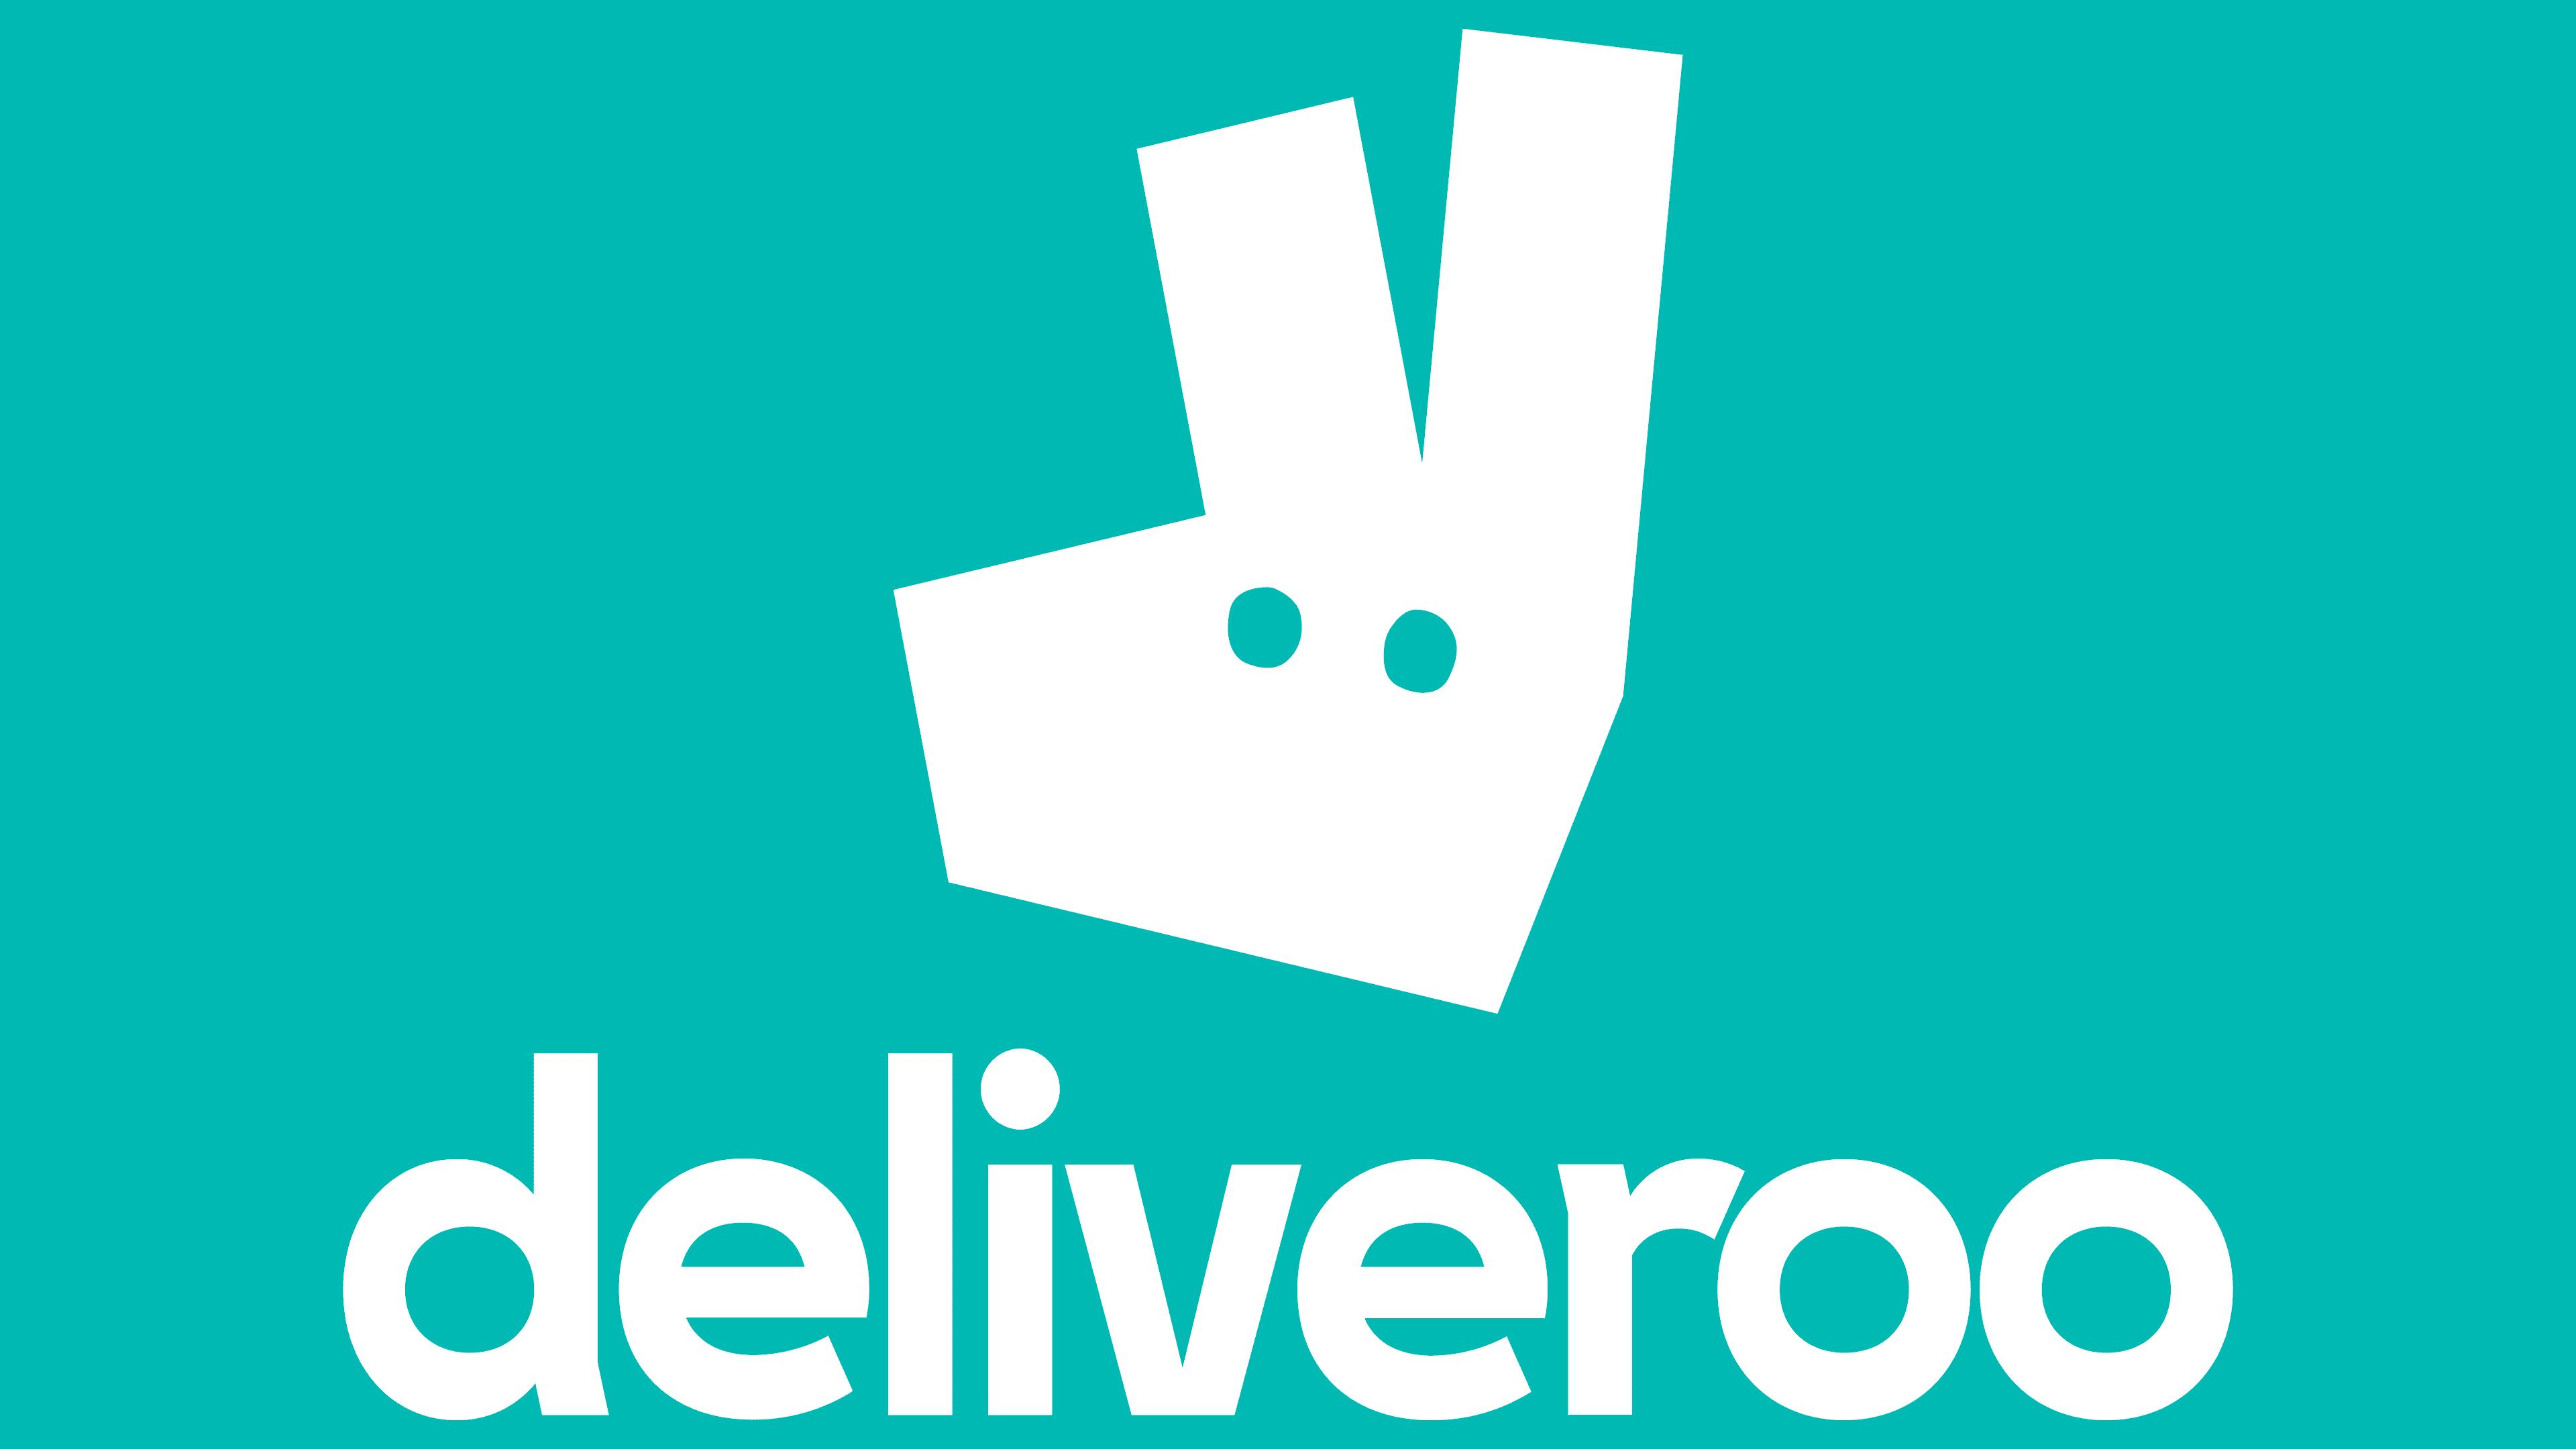 Deliveroo Logo | Symbol, History, PNG (3840*2160)